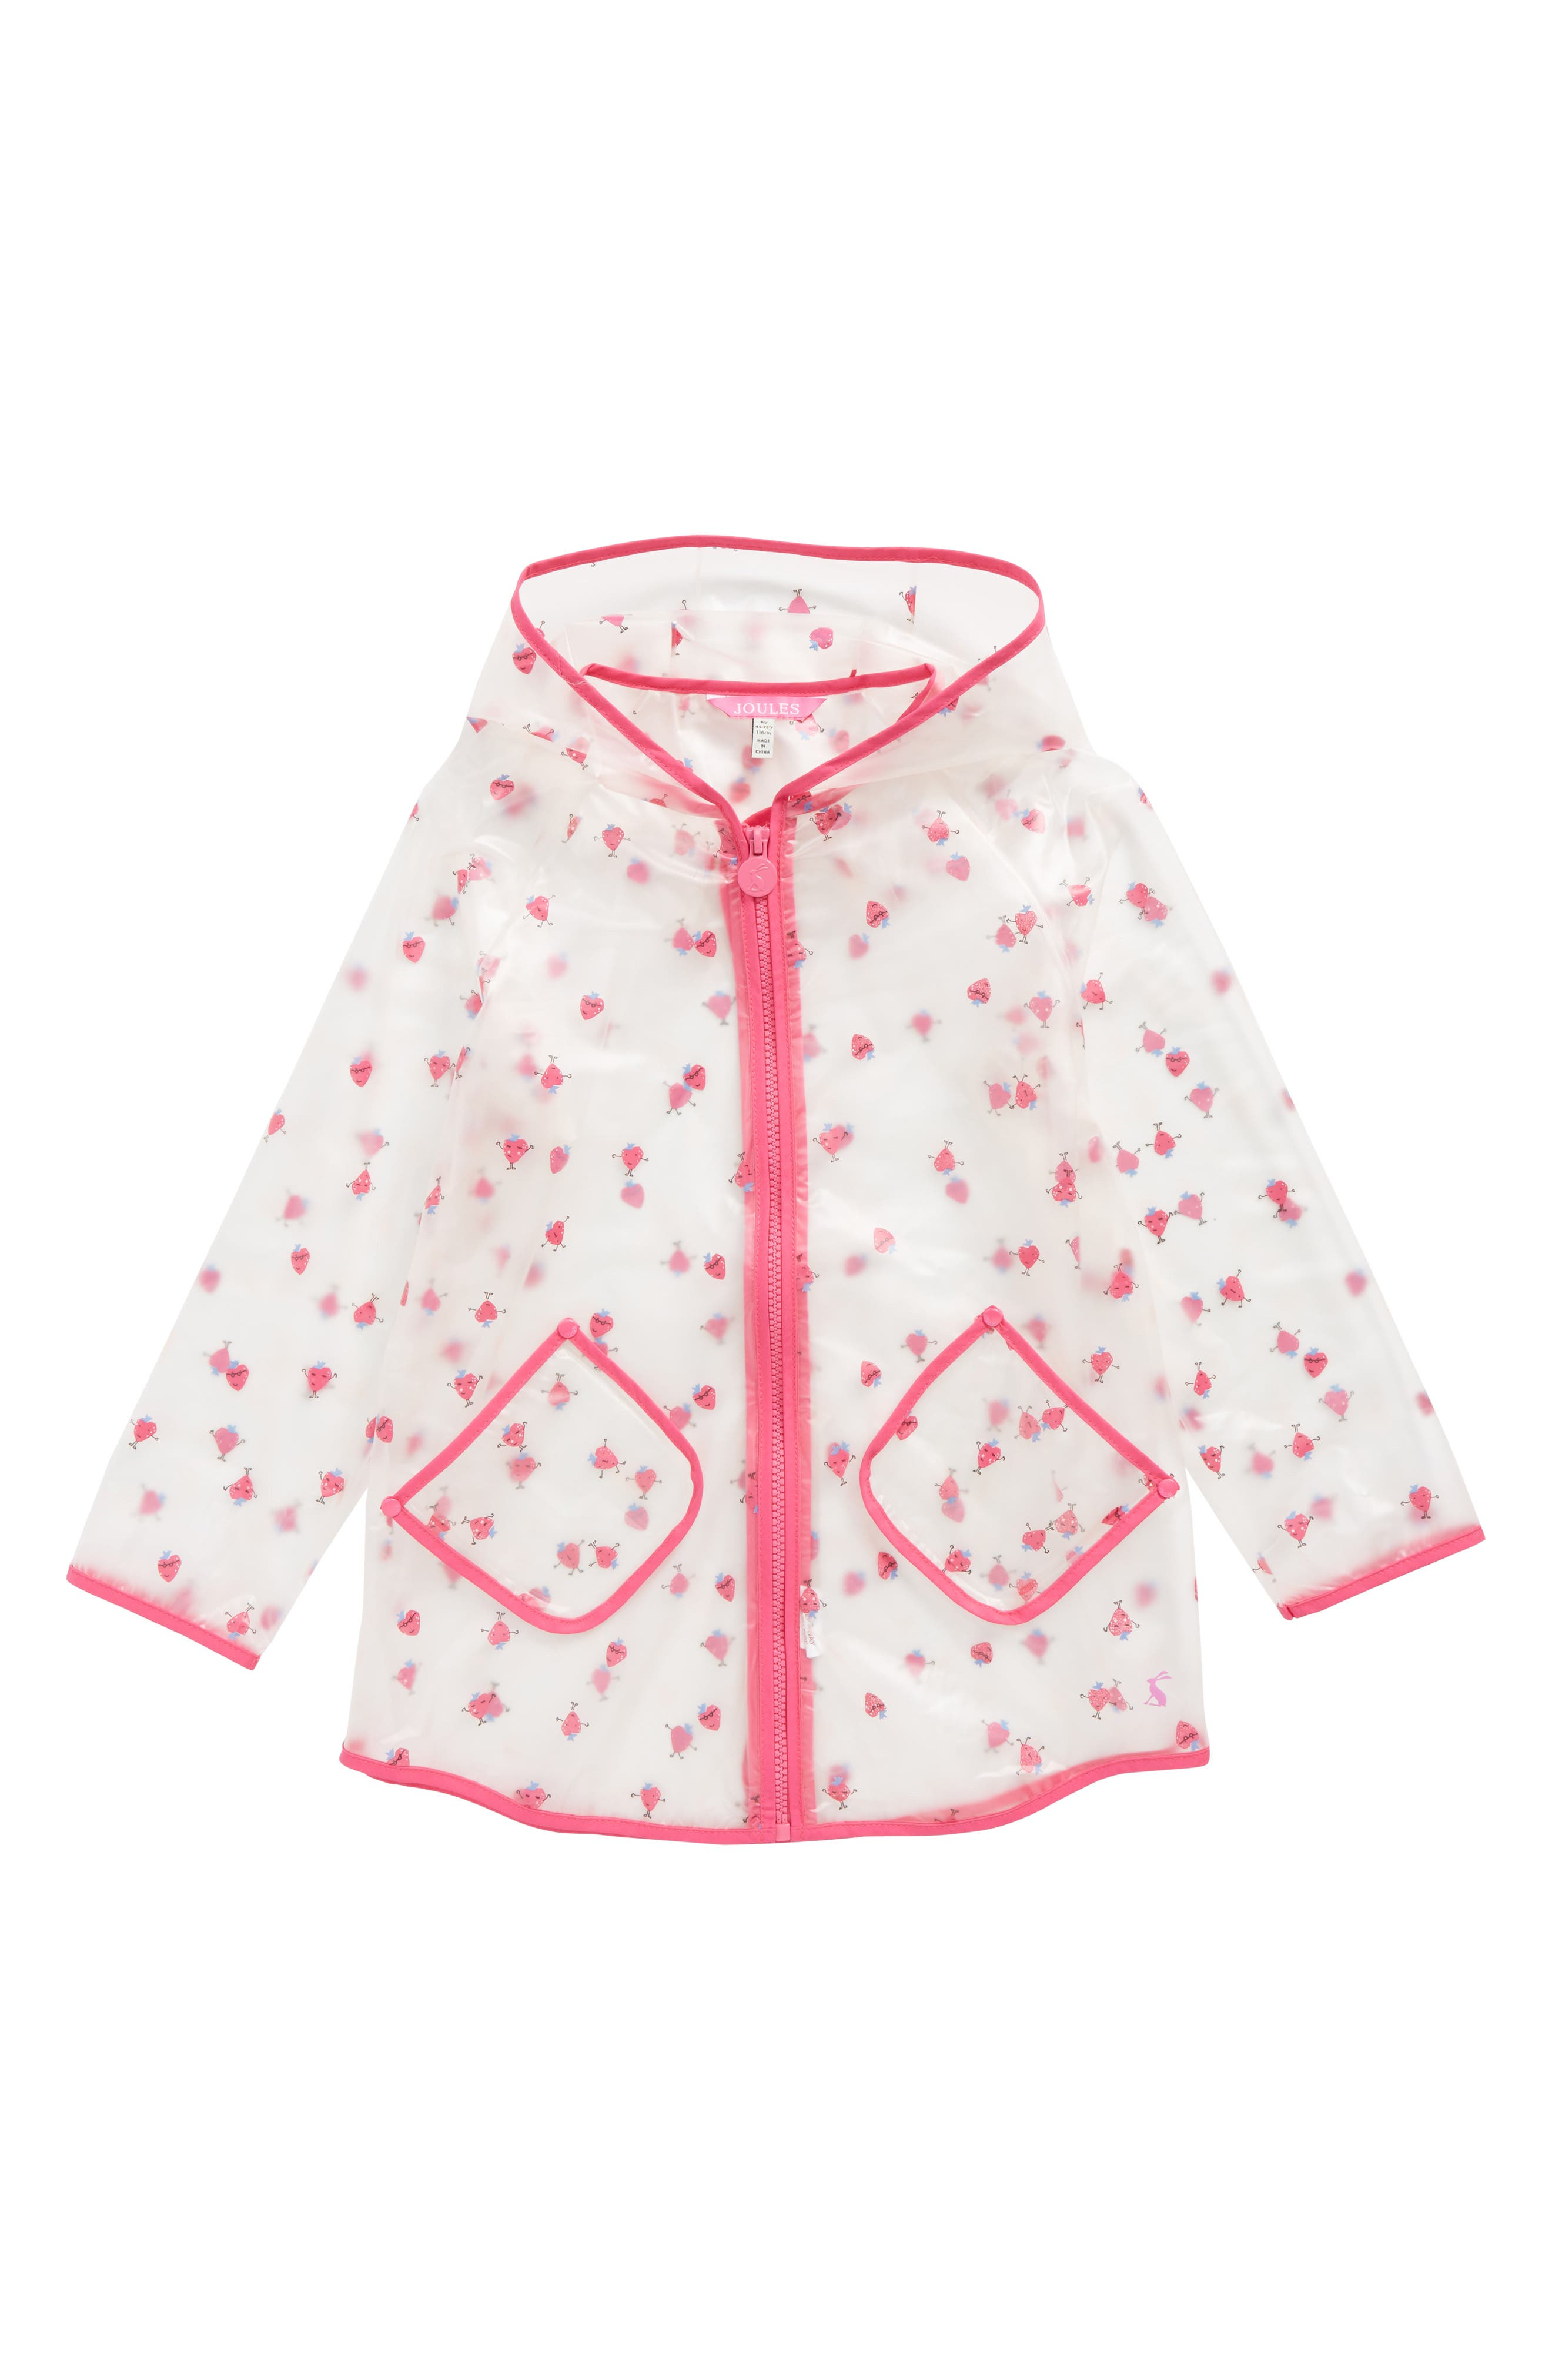 Main Image - Joules Print Sheer Rain Coat (Toddler Girls & Little Girls)